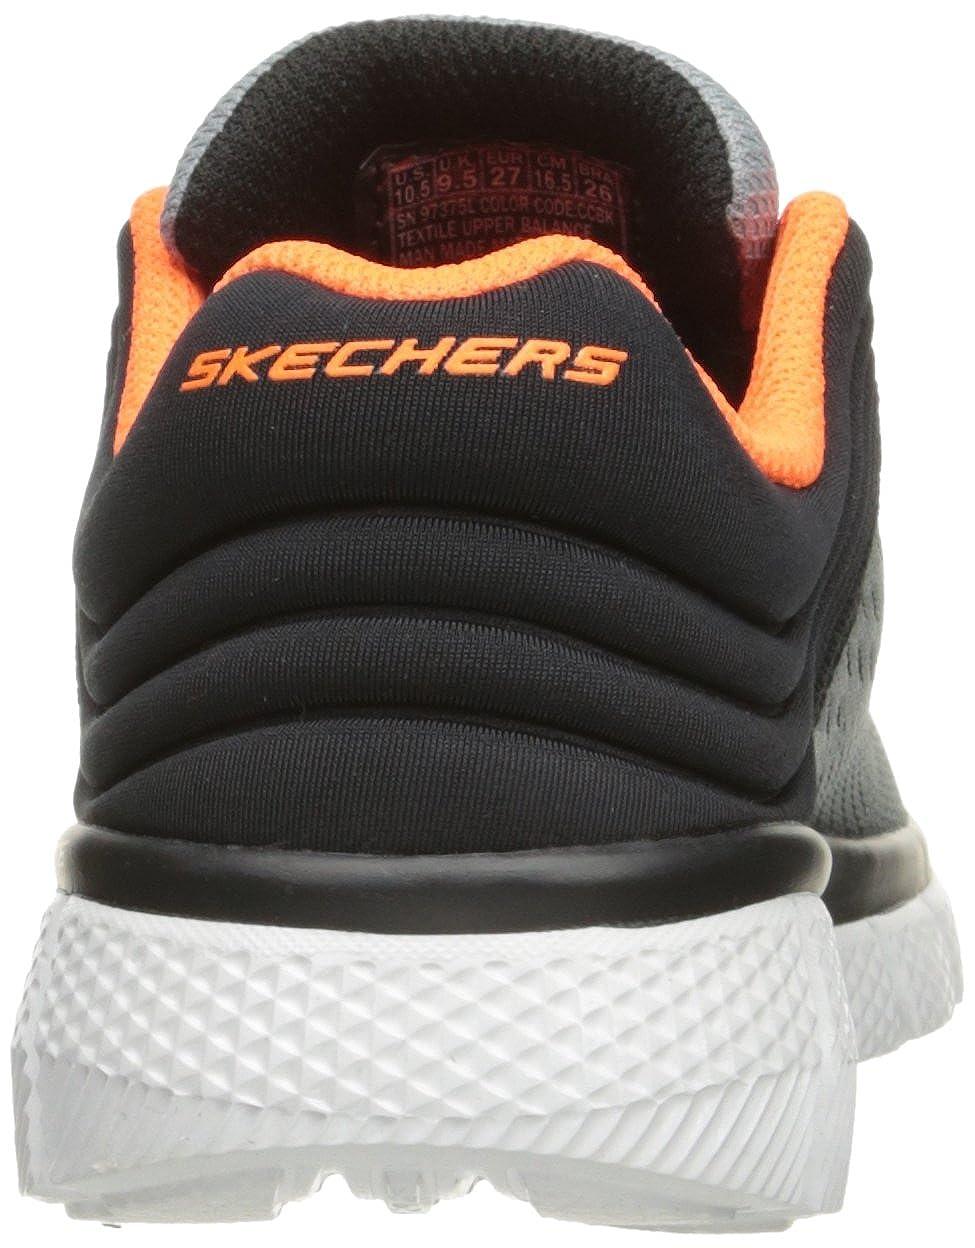 Skechers Equalizer 2.0-Post Season 8c33fa9c8ba